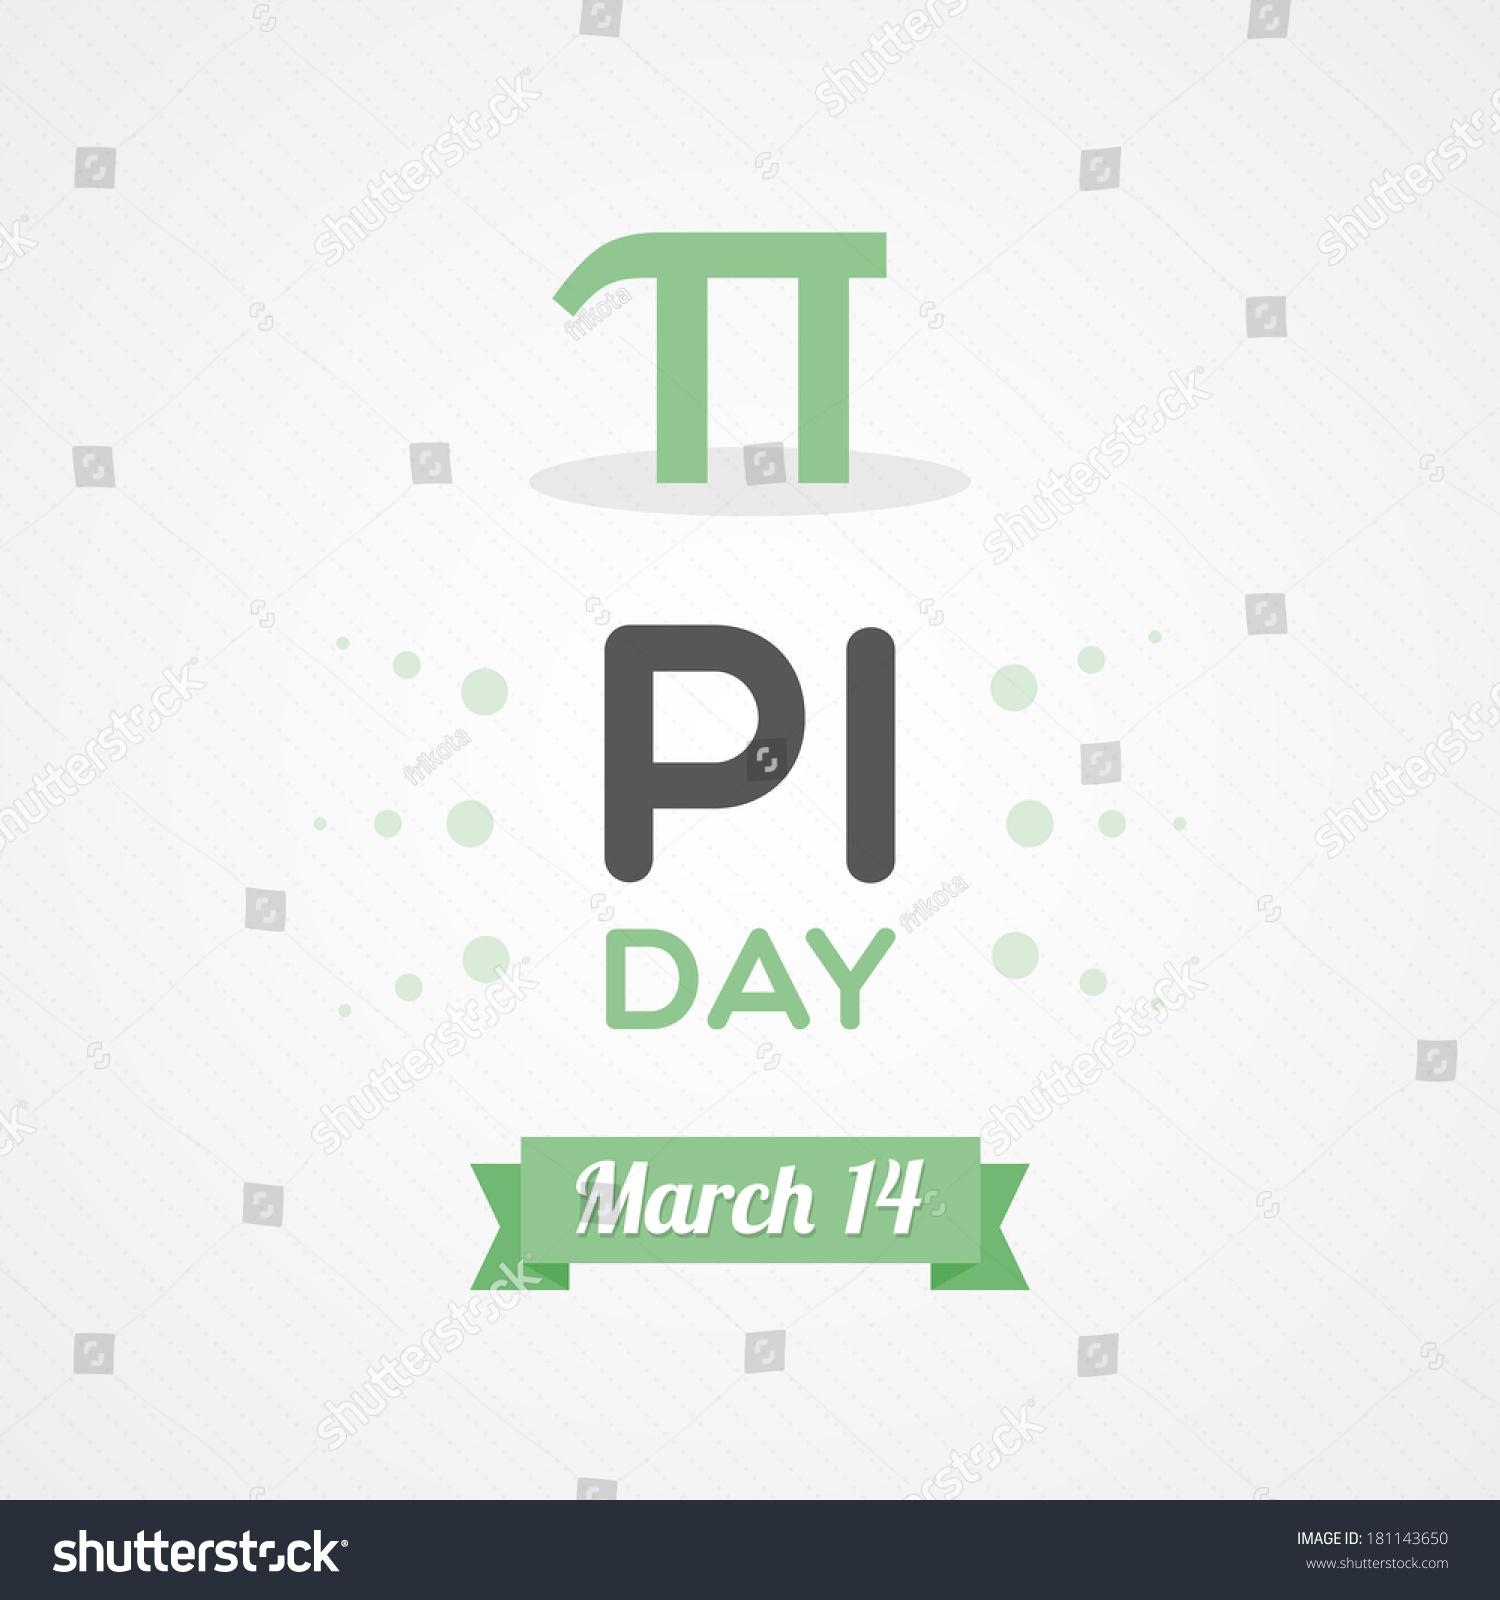 Pi Day 314 Stock Vector